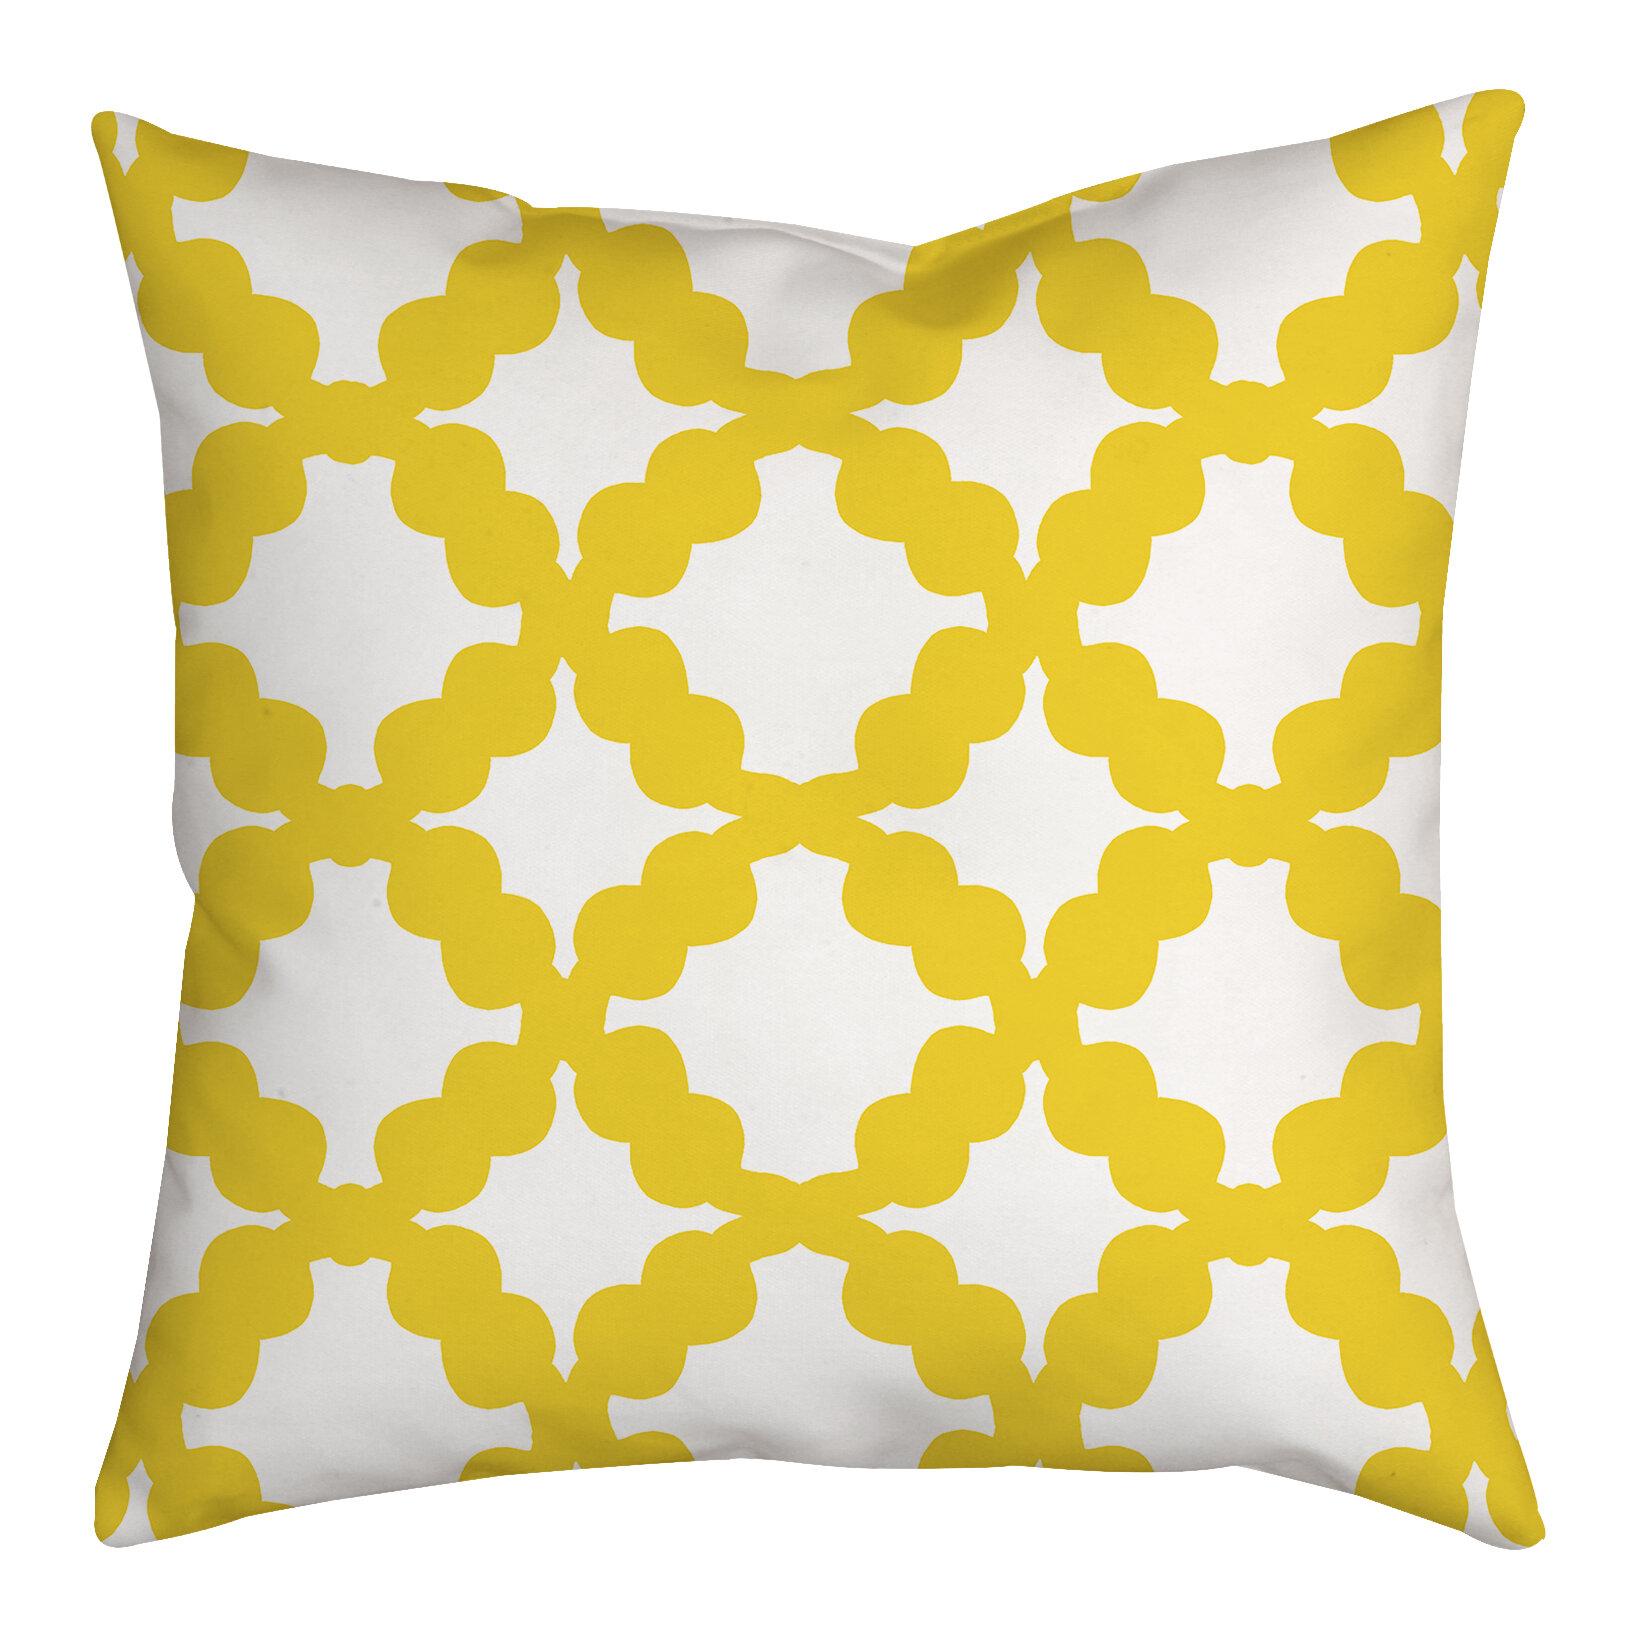 Safiyajamila Simply Geometric Indoor Outdoor Throw Pillow Wayfair